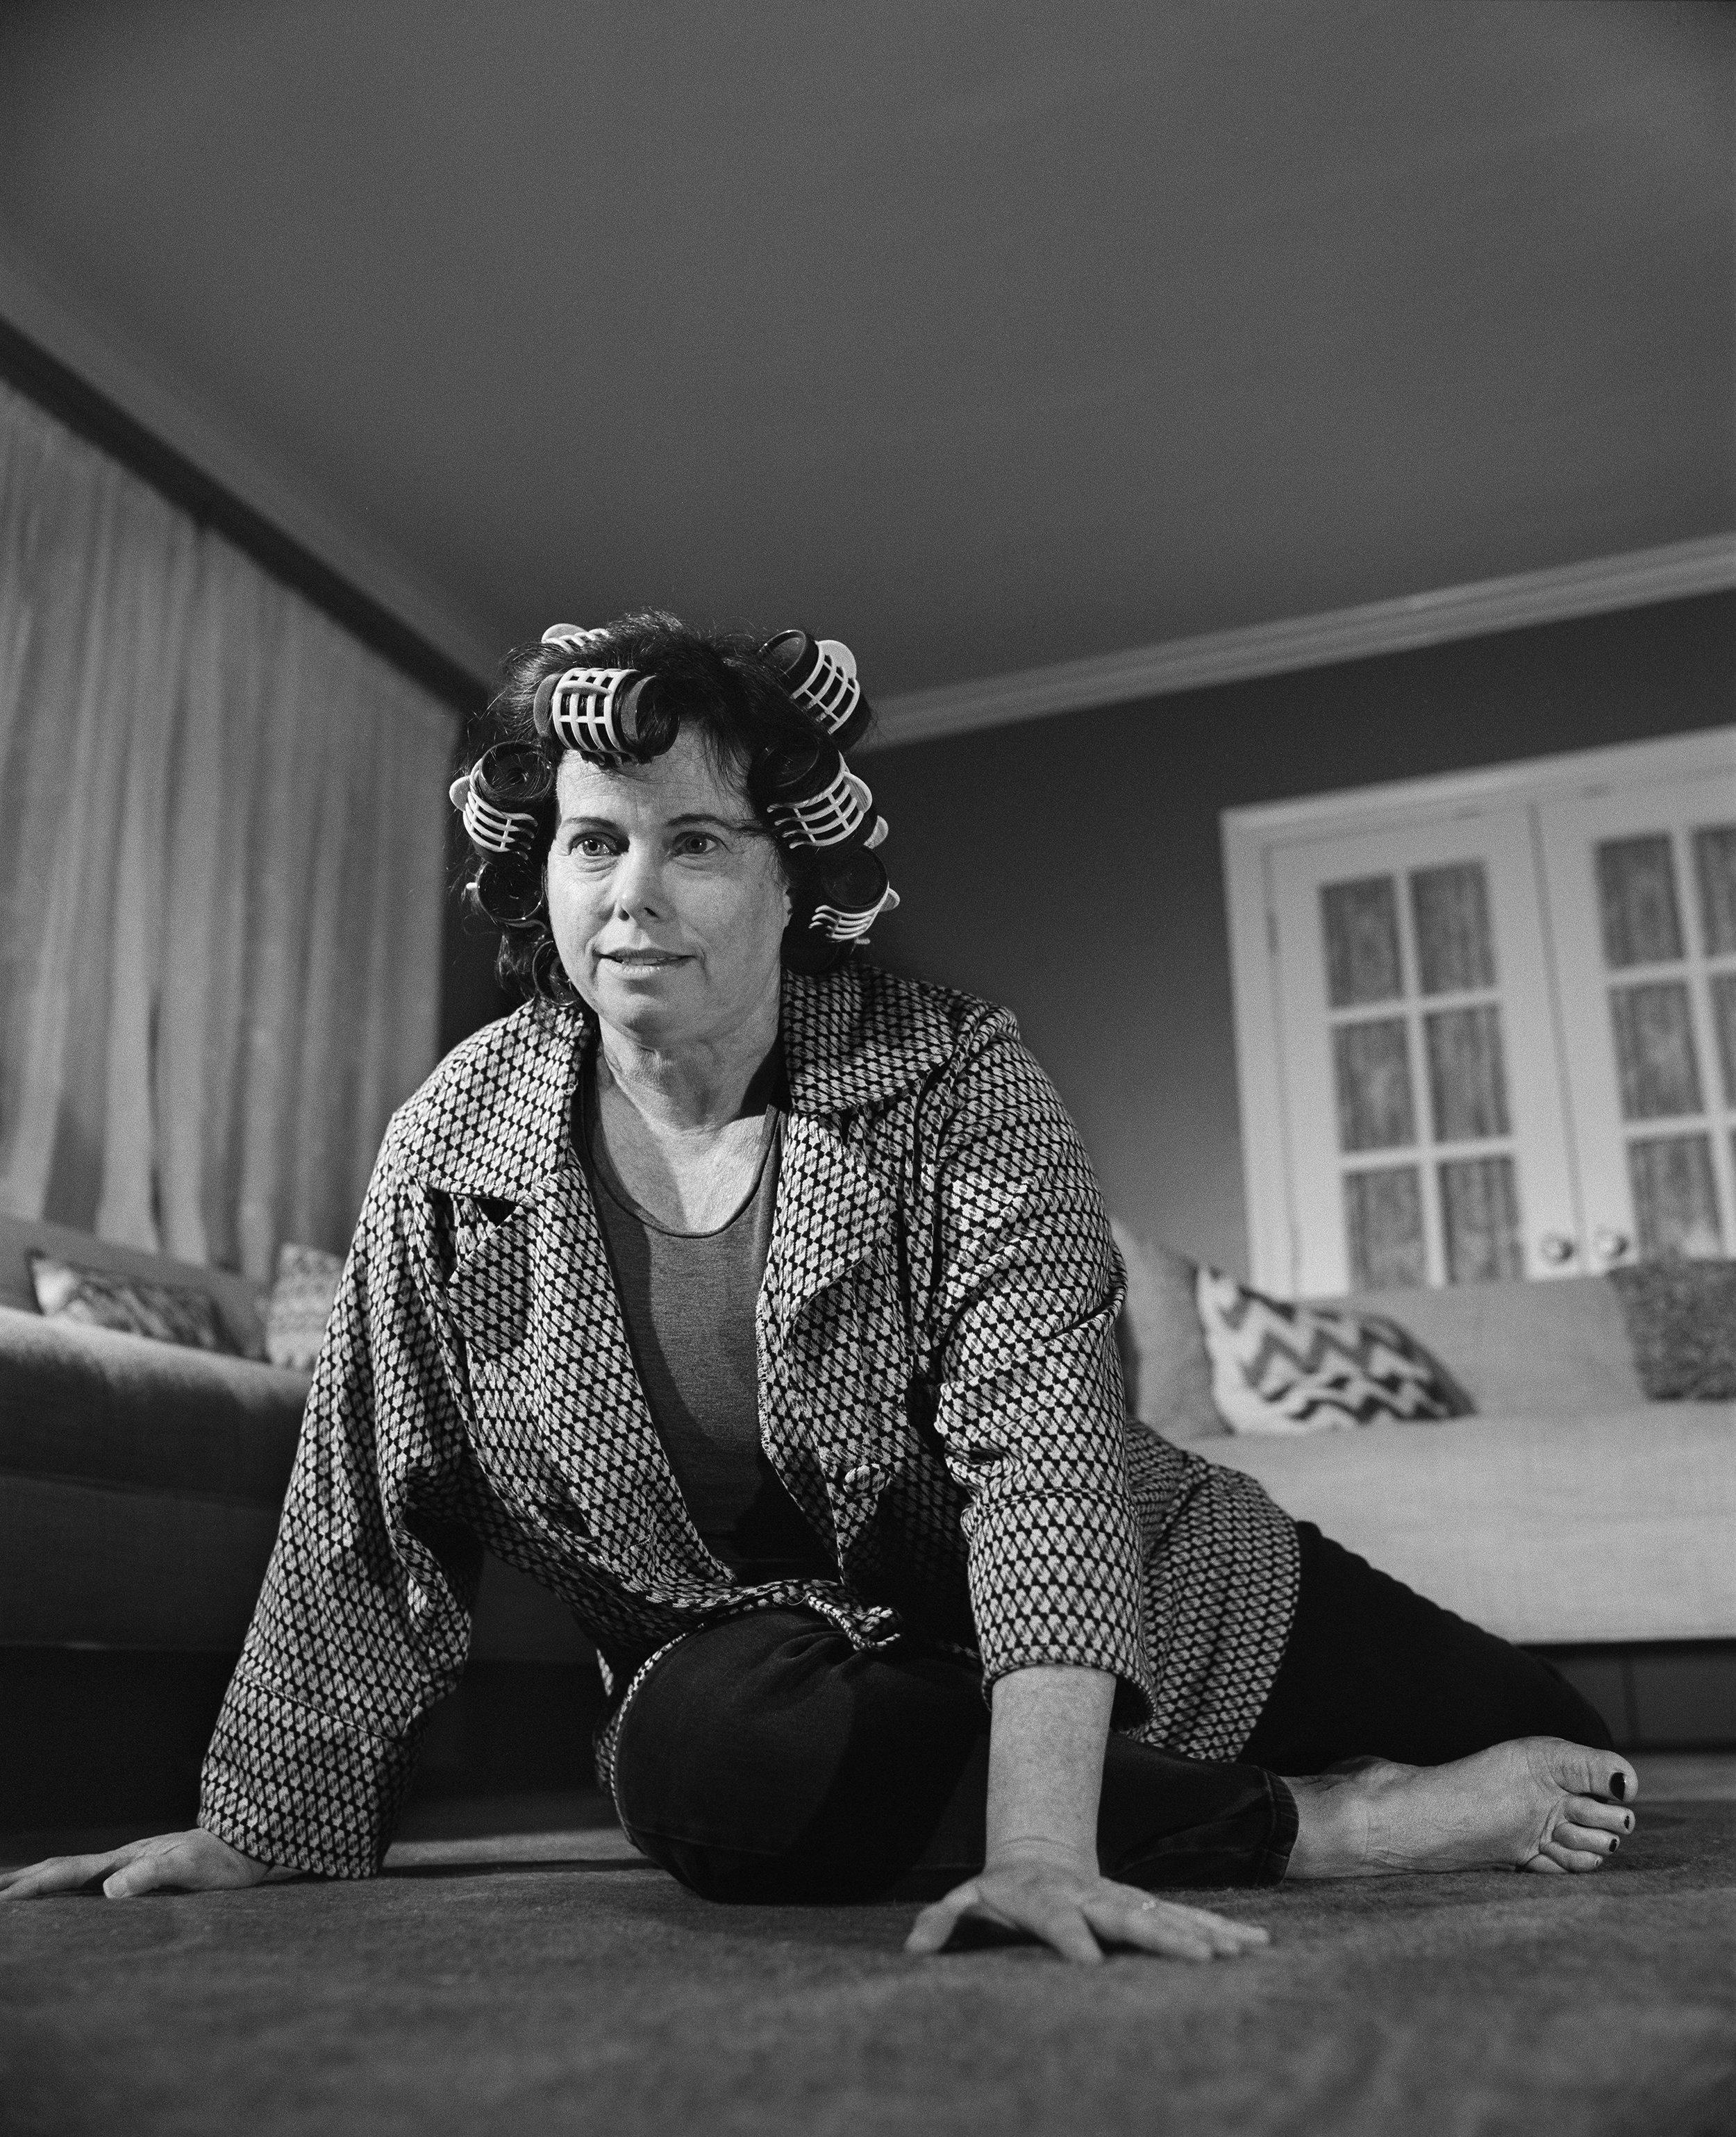 Bonnie-Carpet-Haunches-_Grayscale16Bit.jpg